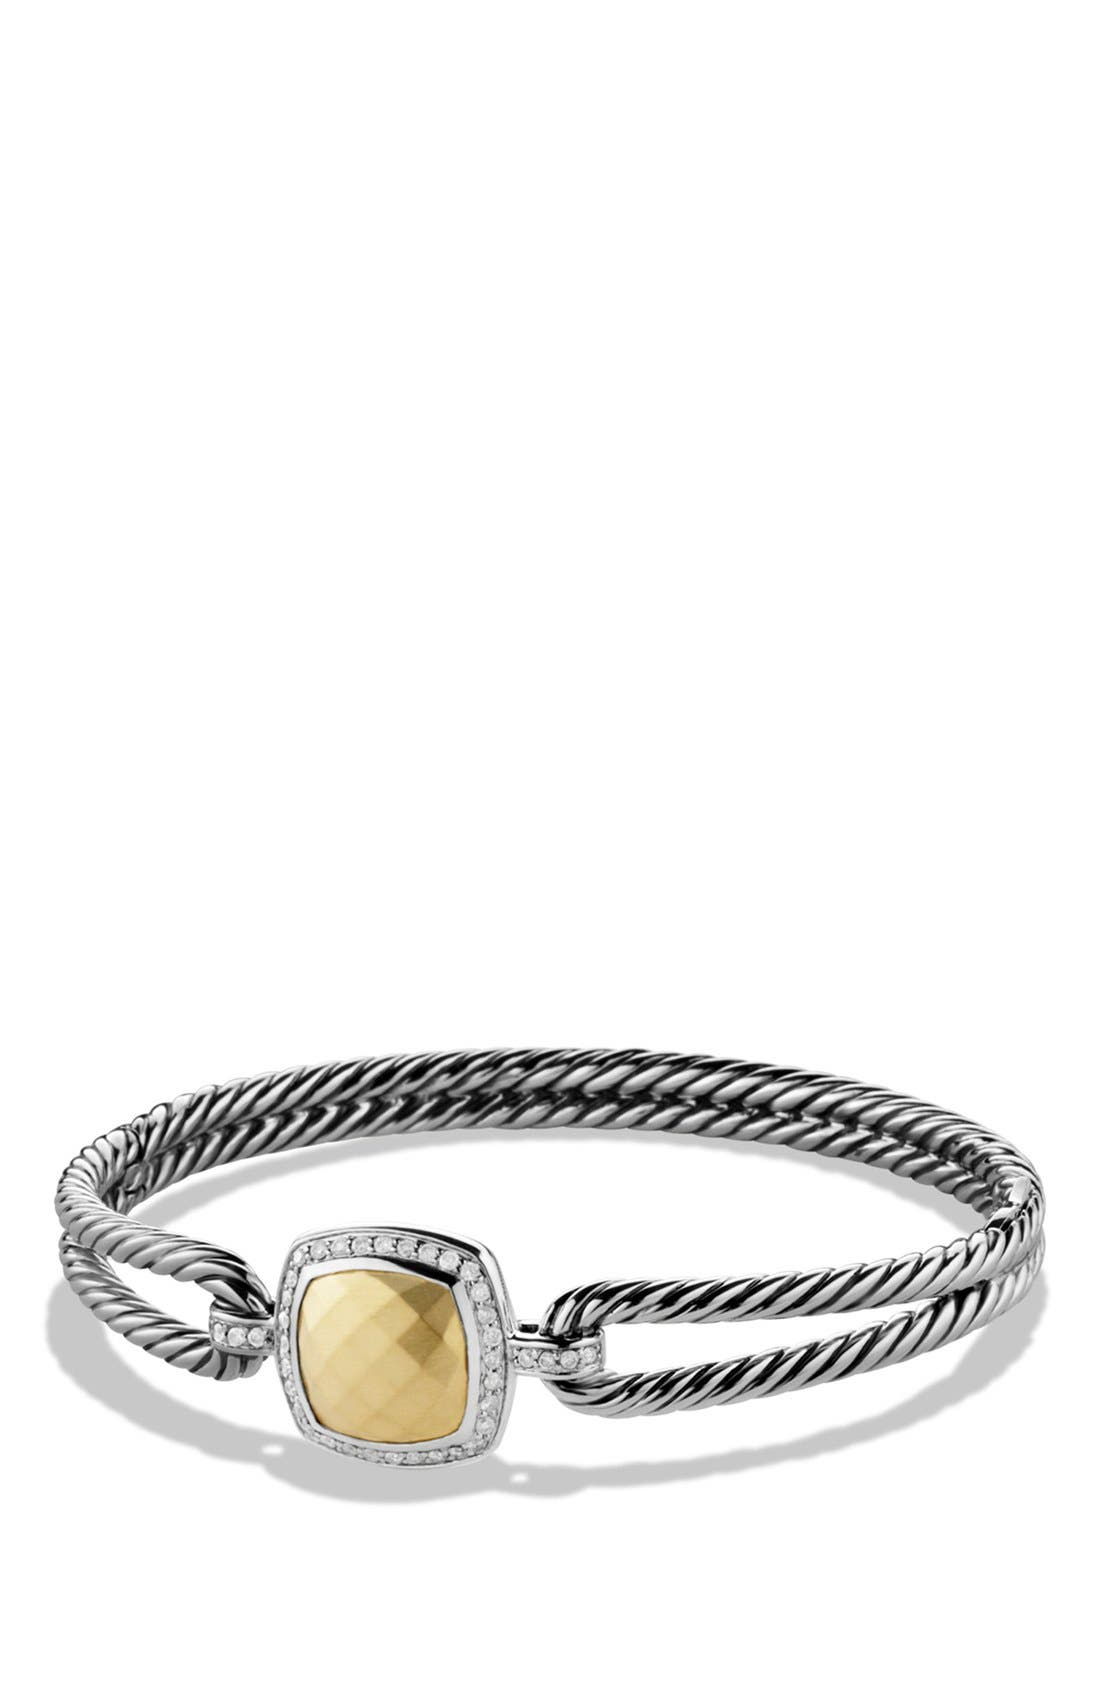 Main Image - David Yurman 'Albion' Bracelet with Diamonds and Gold